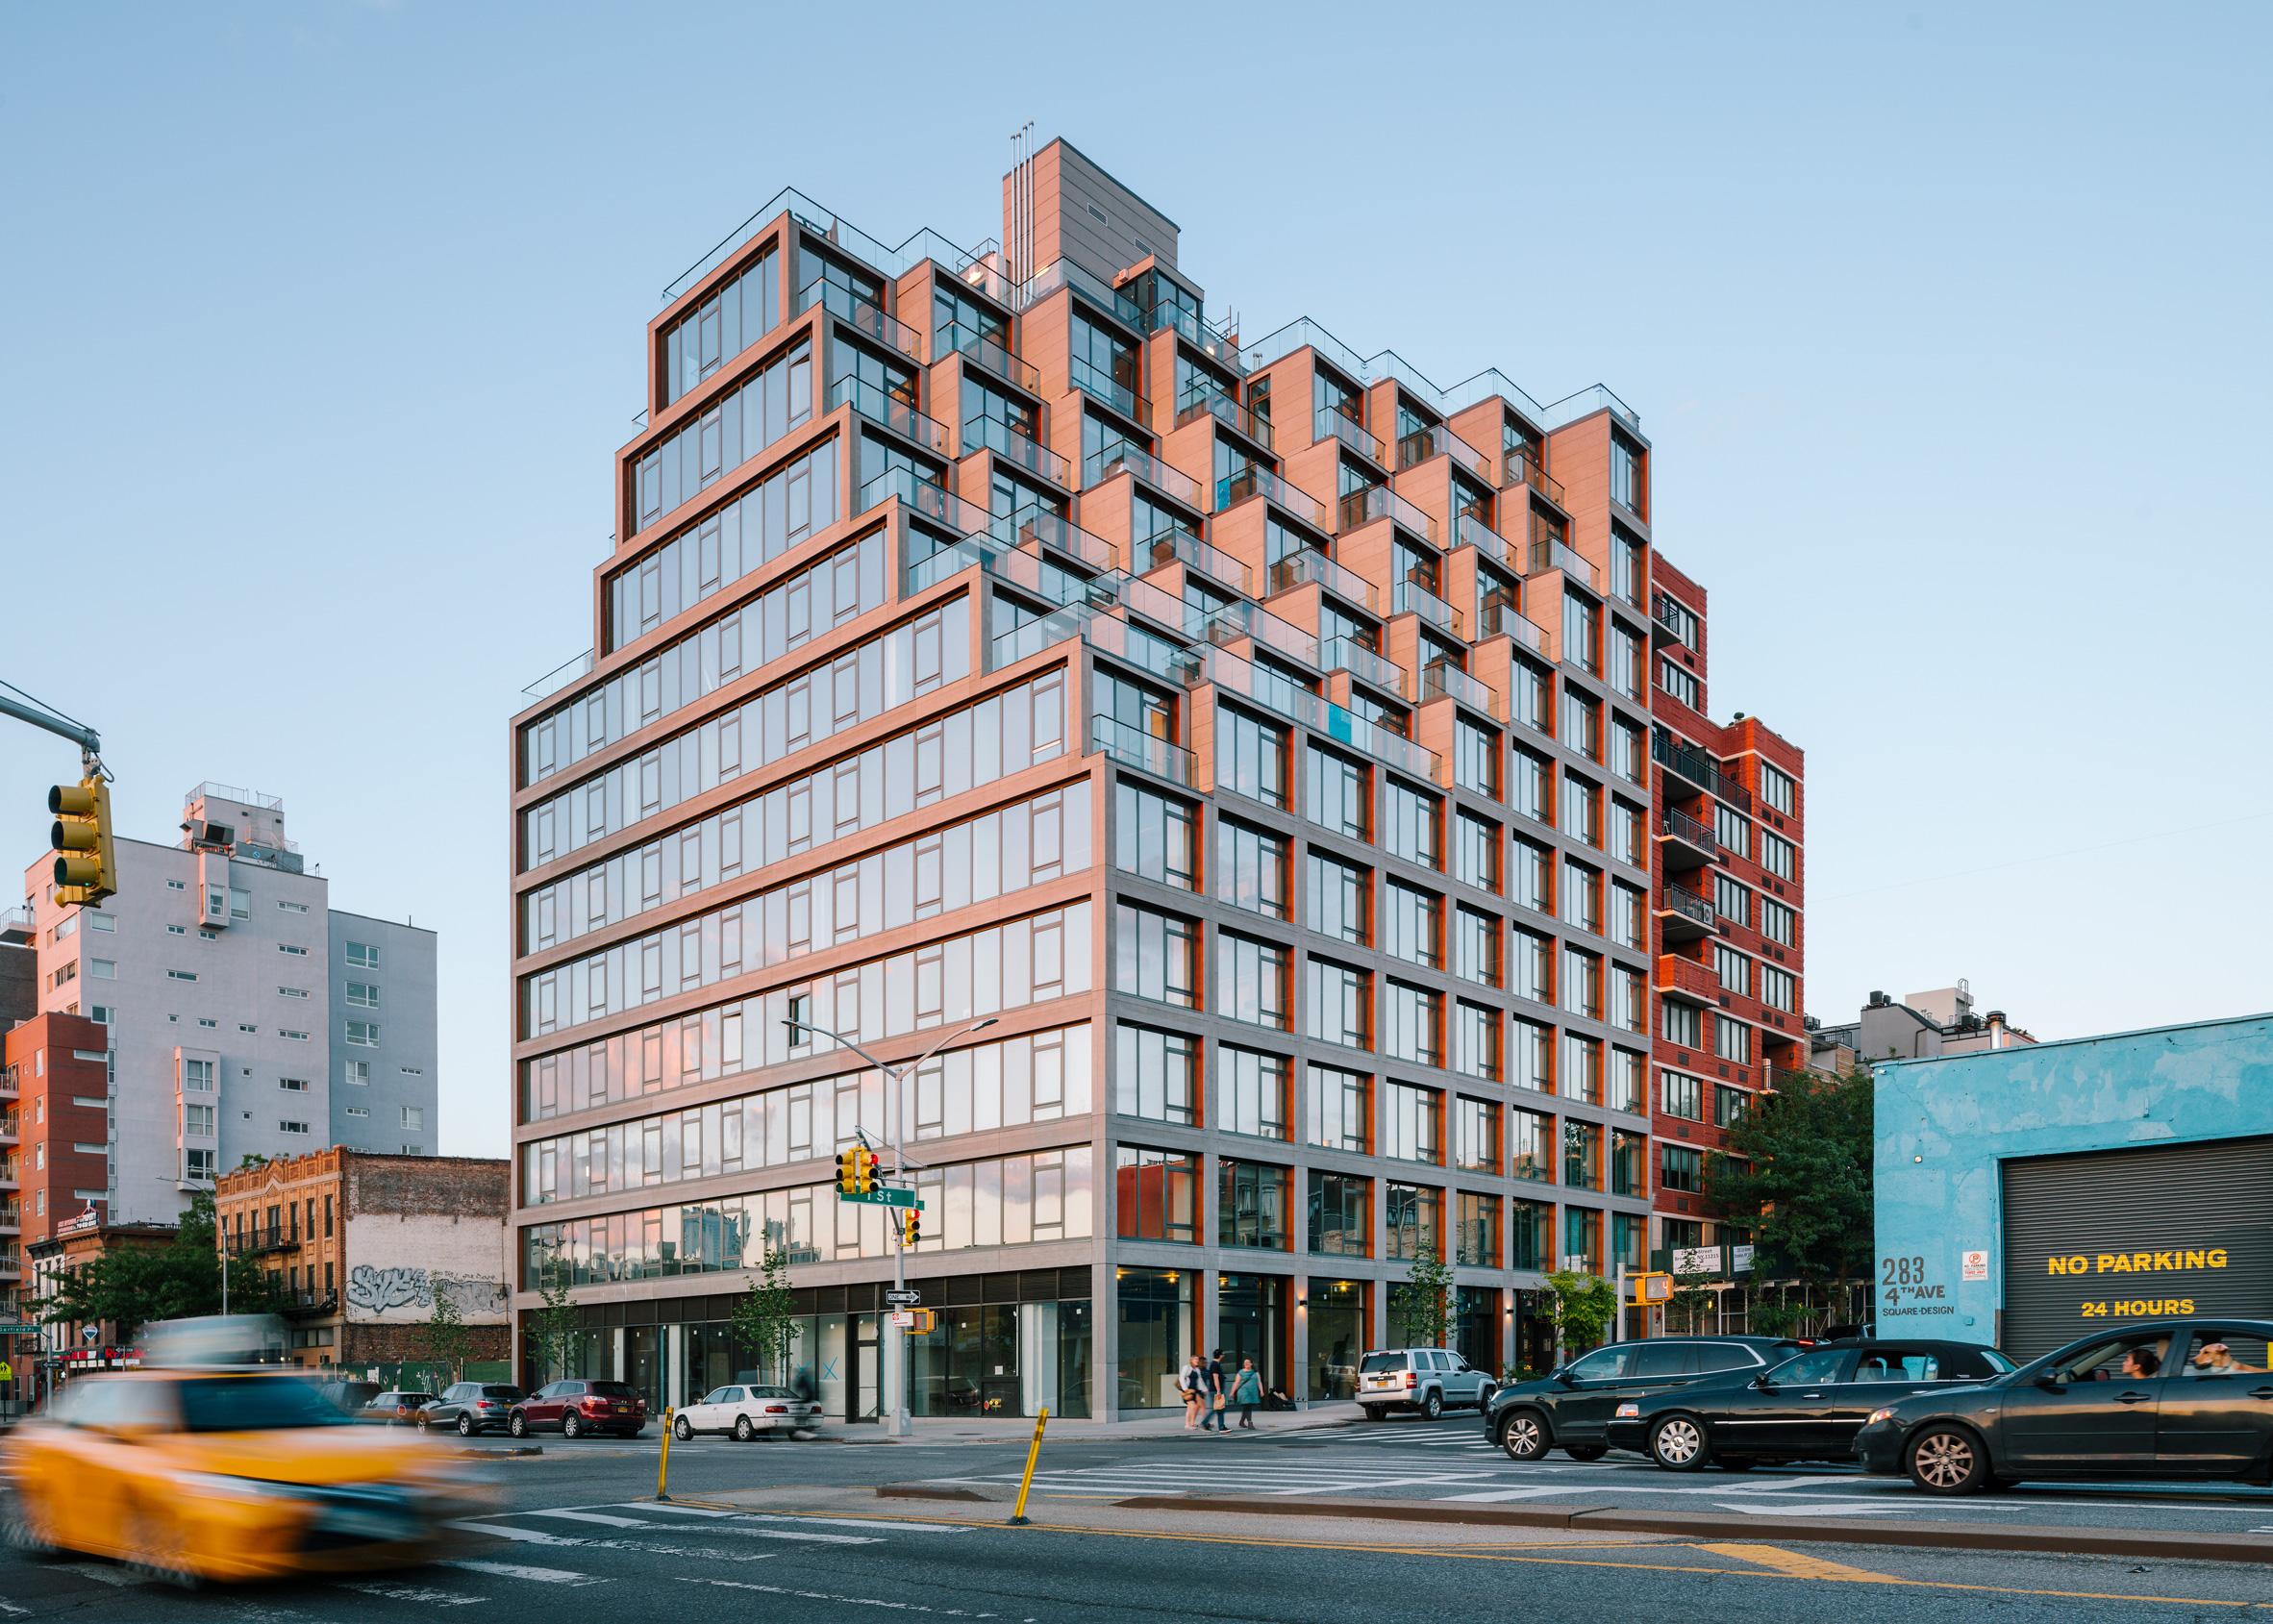 251 1st Street by ODA, New York City, USA